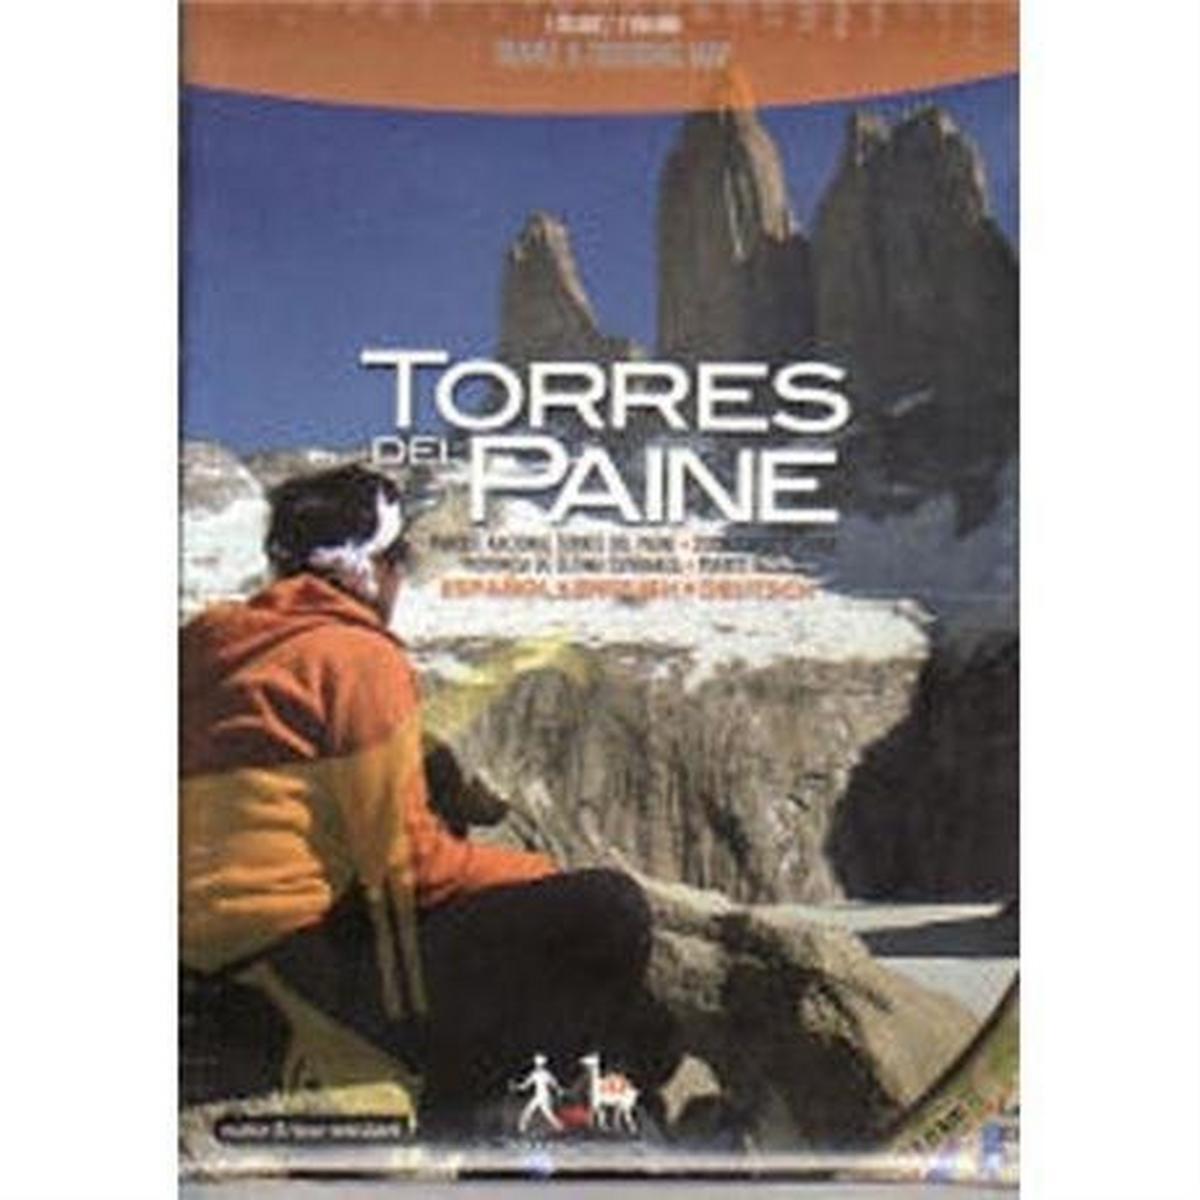 Miscellaneous Chile Map: Torres del Paine Chile 1:100,000 & 1:50,000